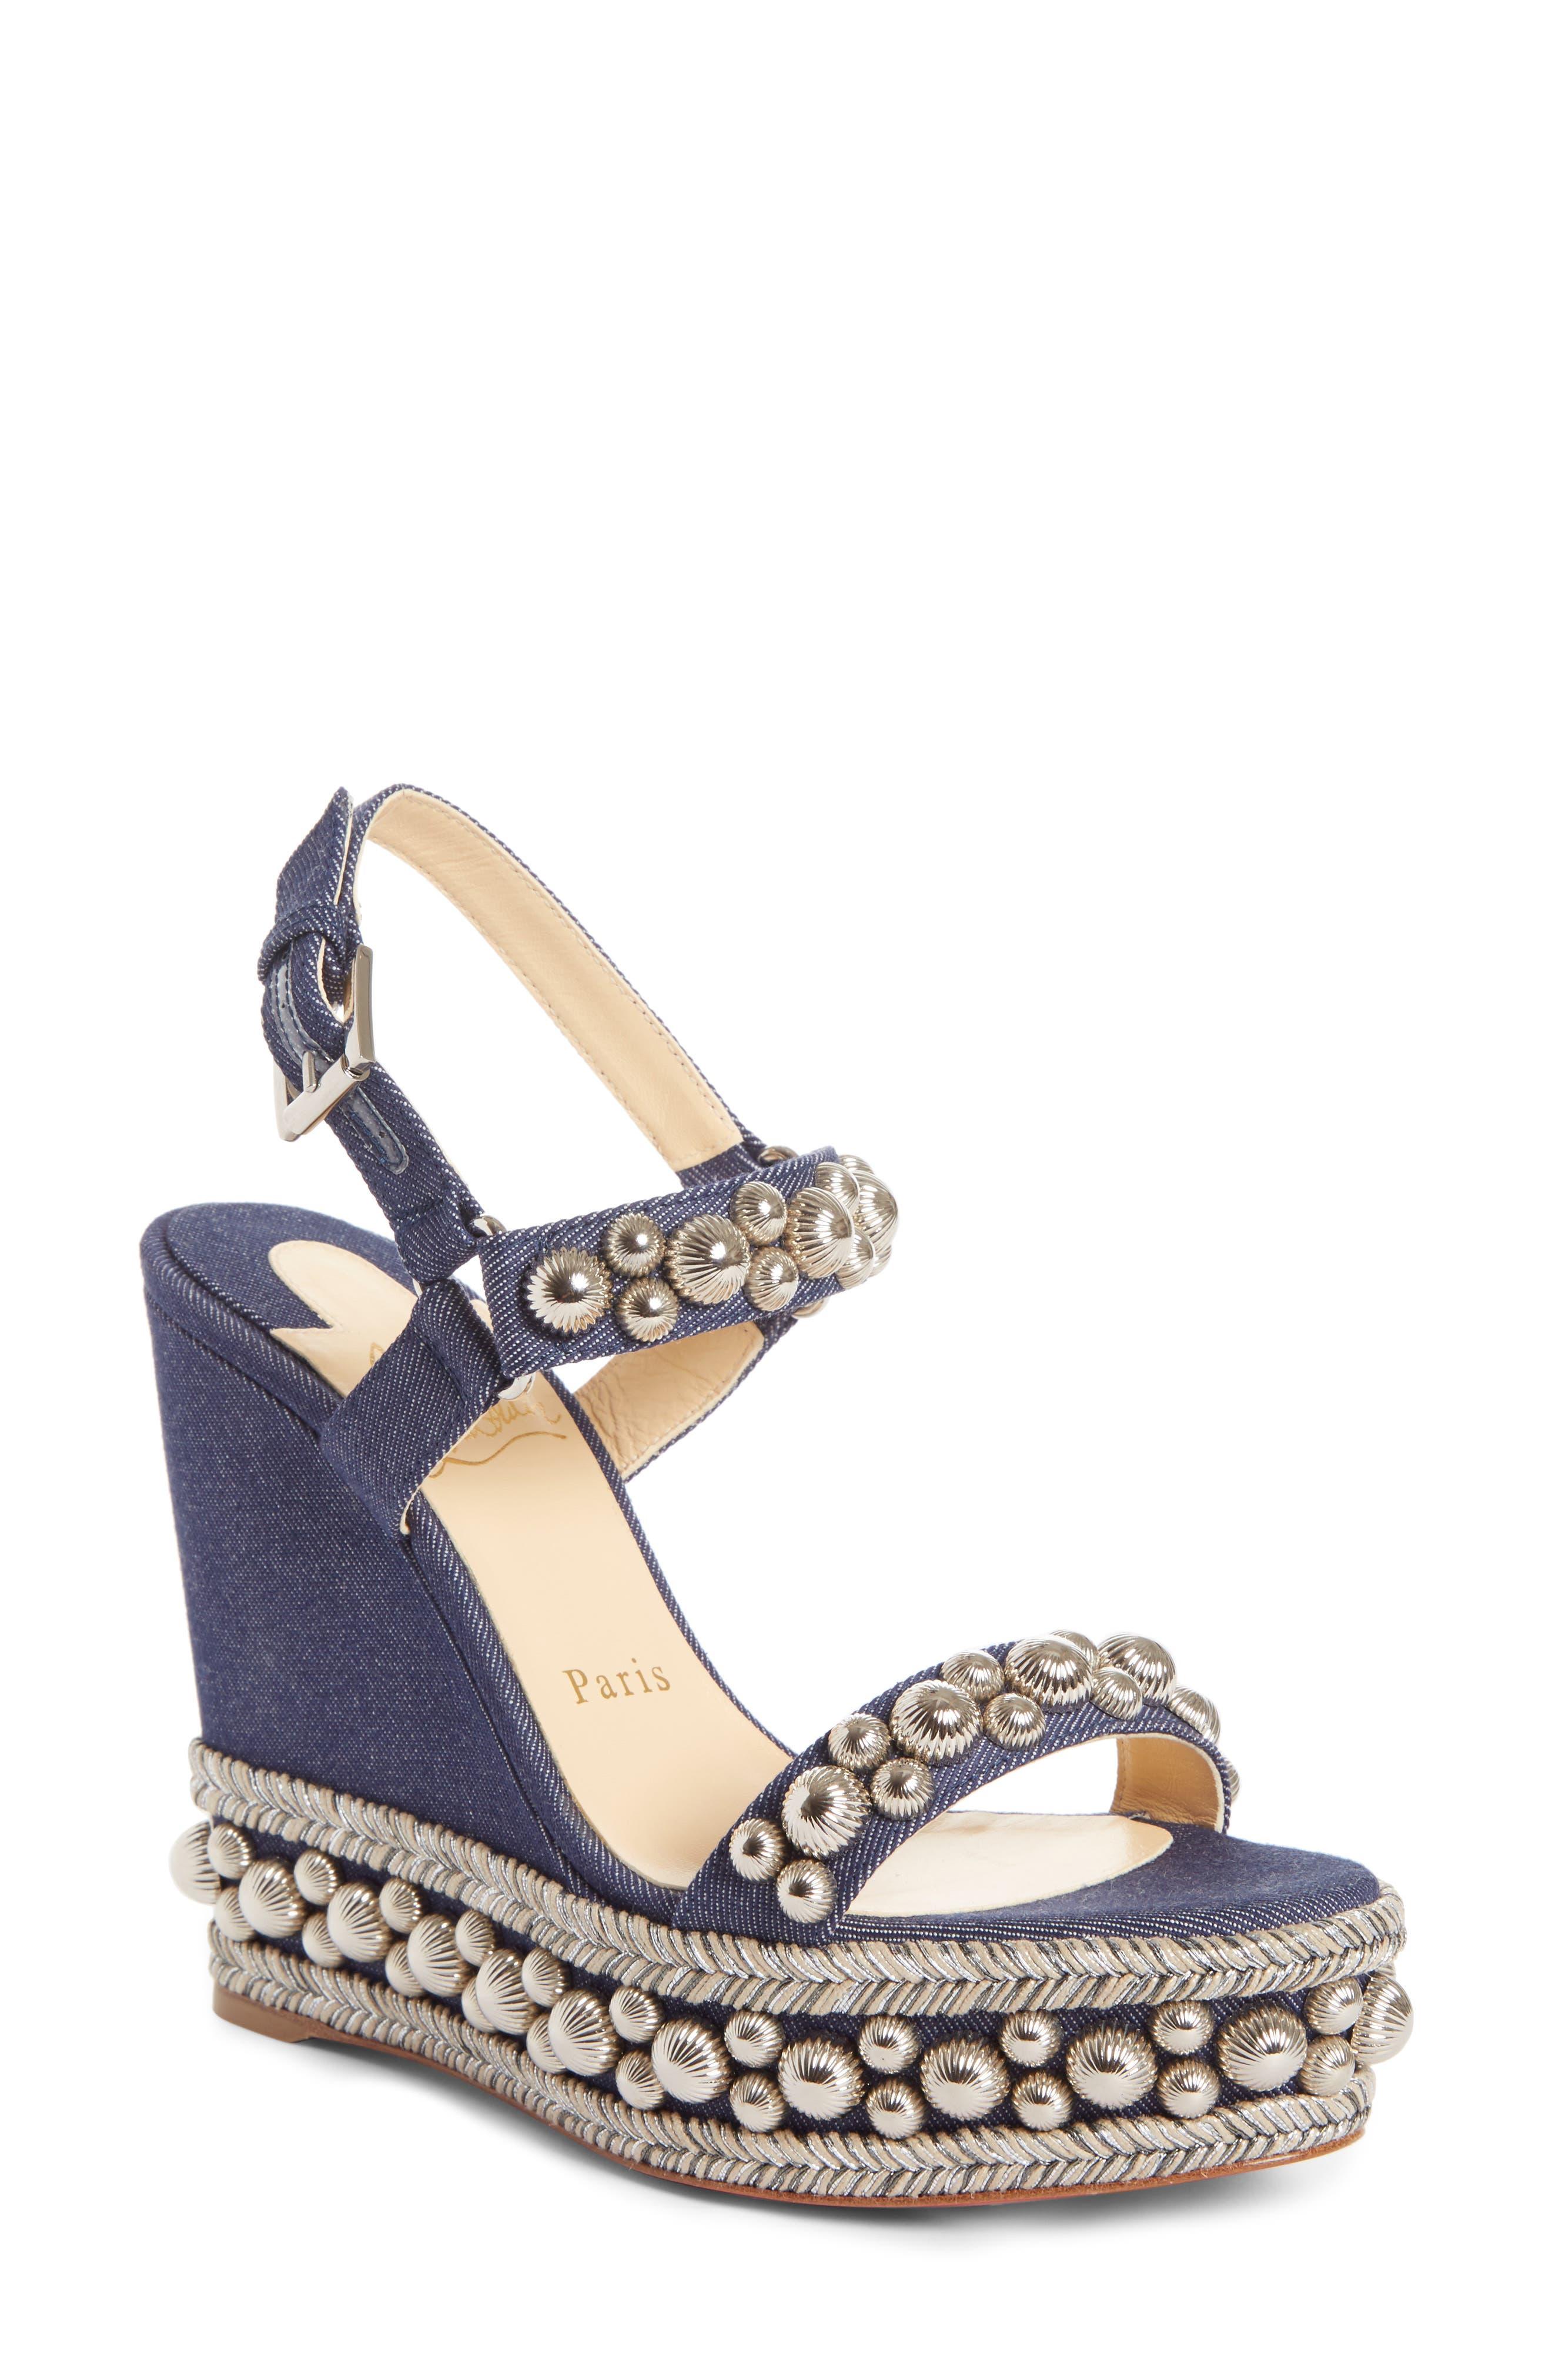 Rondaclou Studded Wedge Sandal,                         Main,                         color, Denim Blue